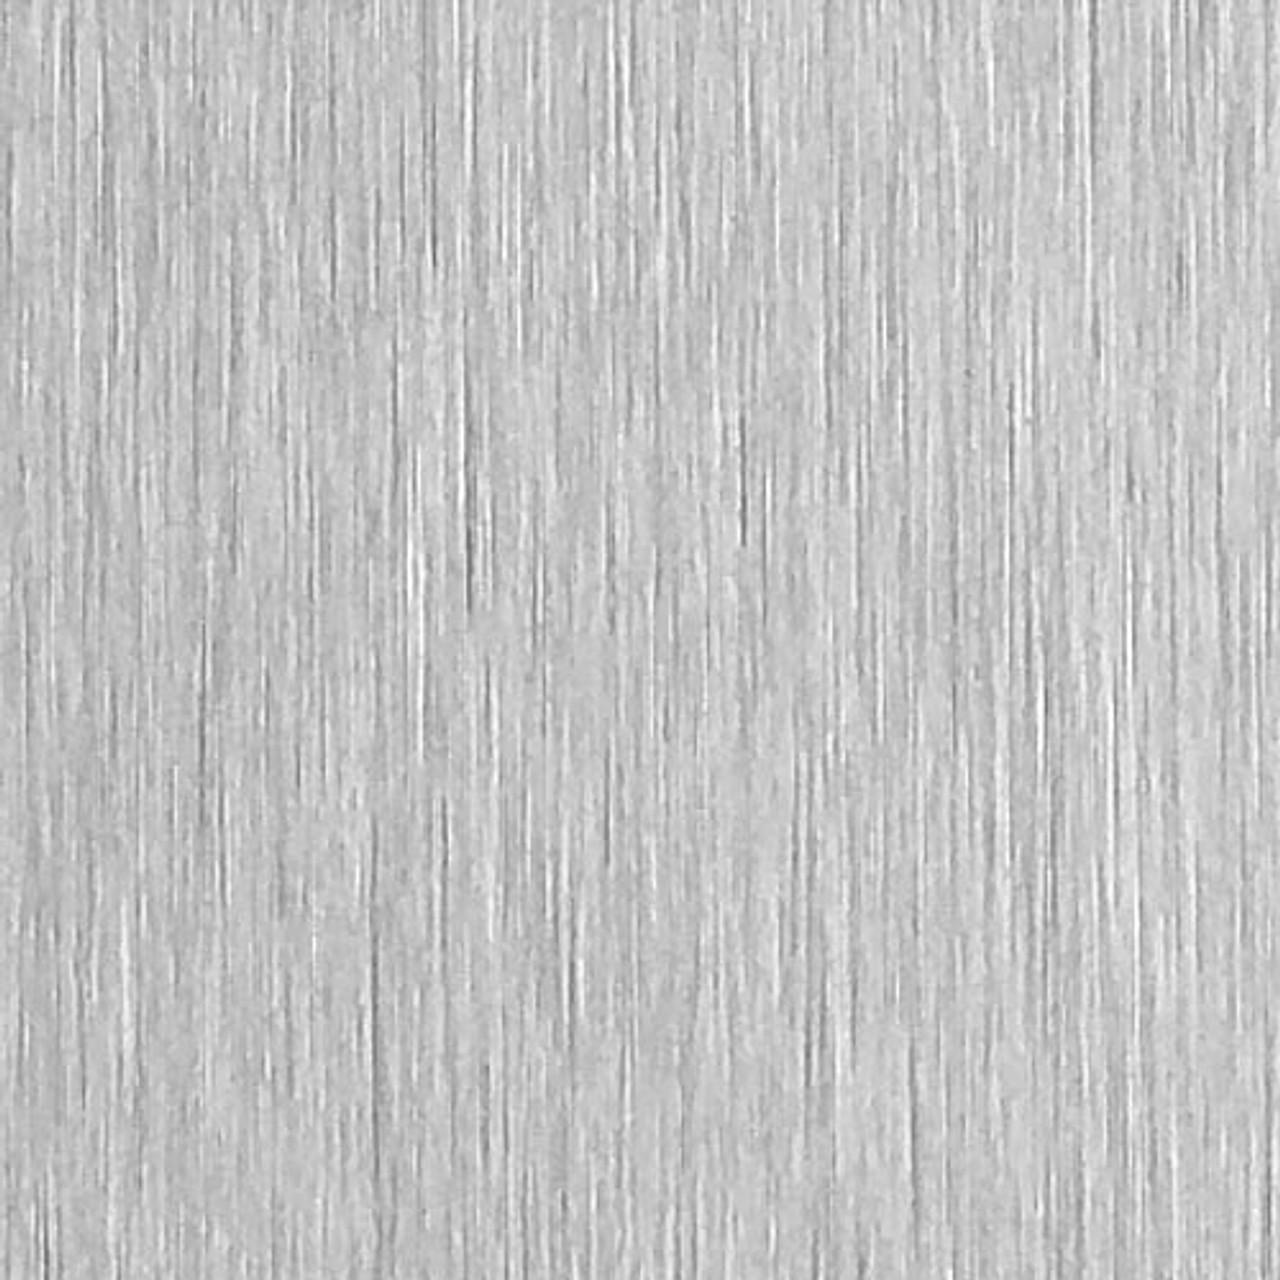 Formica Brushed Aluminum  4' x 10'